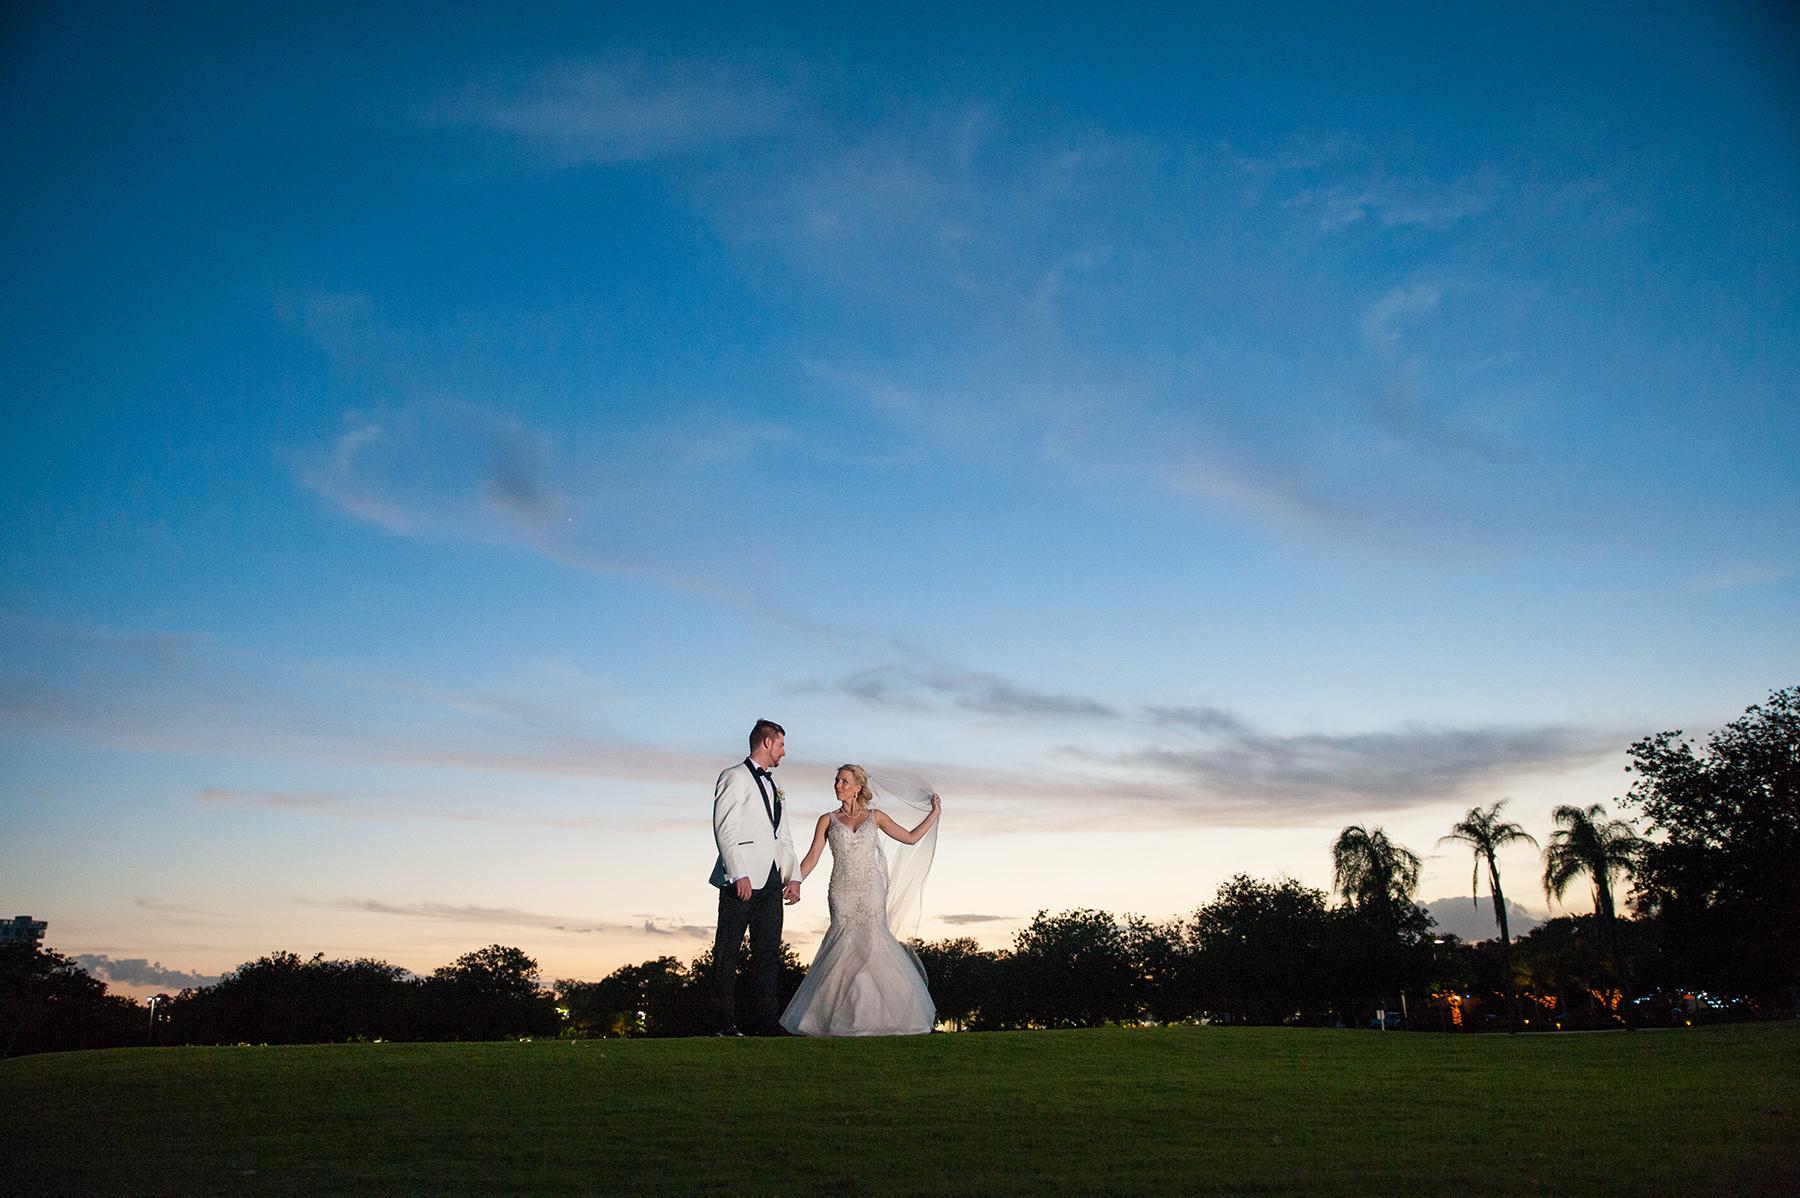 Castorina-Photography-Florida-Wedding-Photographer-Sarasota-Wedding-Photographer-Long-Boat-Key-Club-Wedding-Photographer-108